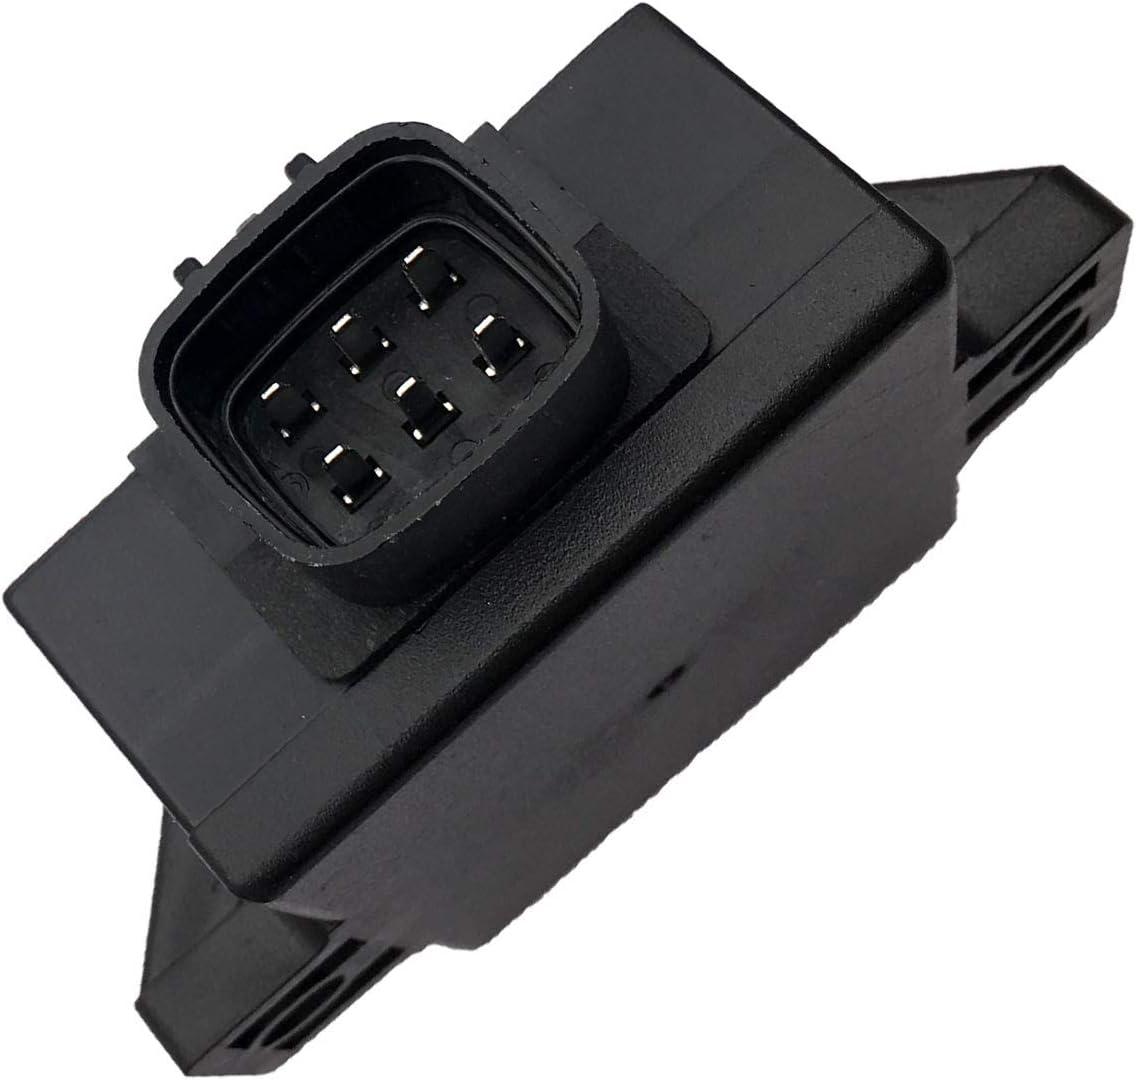 Aokus Ignition Coil Spark Plug CDI Compatible with Kawasaki Bayou 220 KLF220A Bayou 250 KLF250A